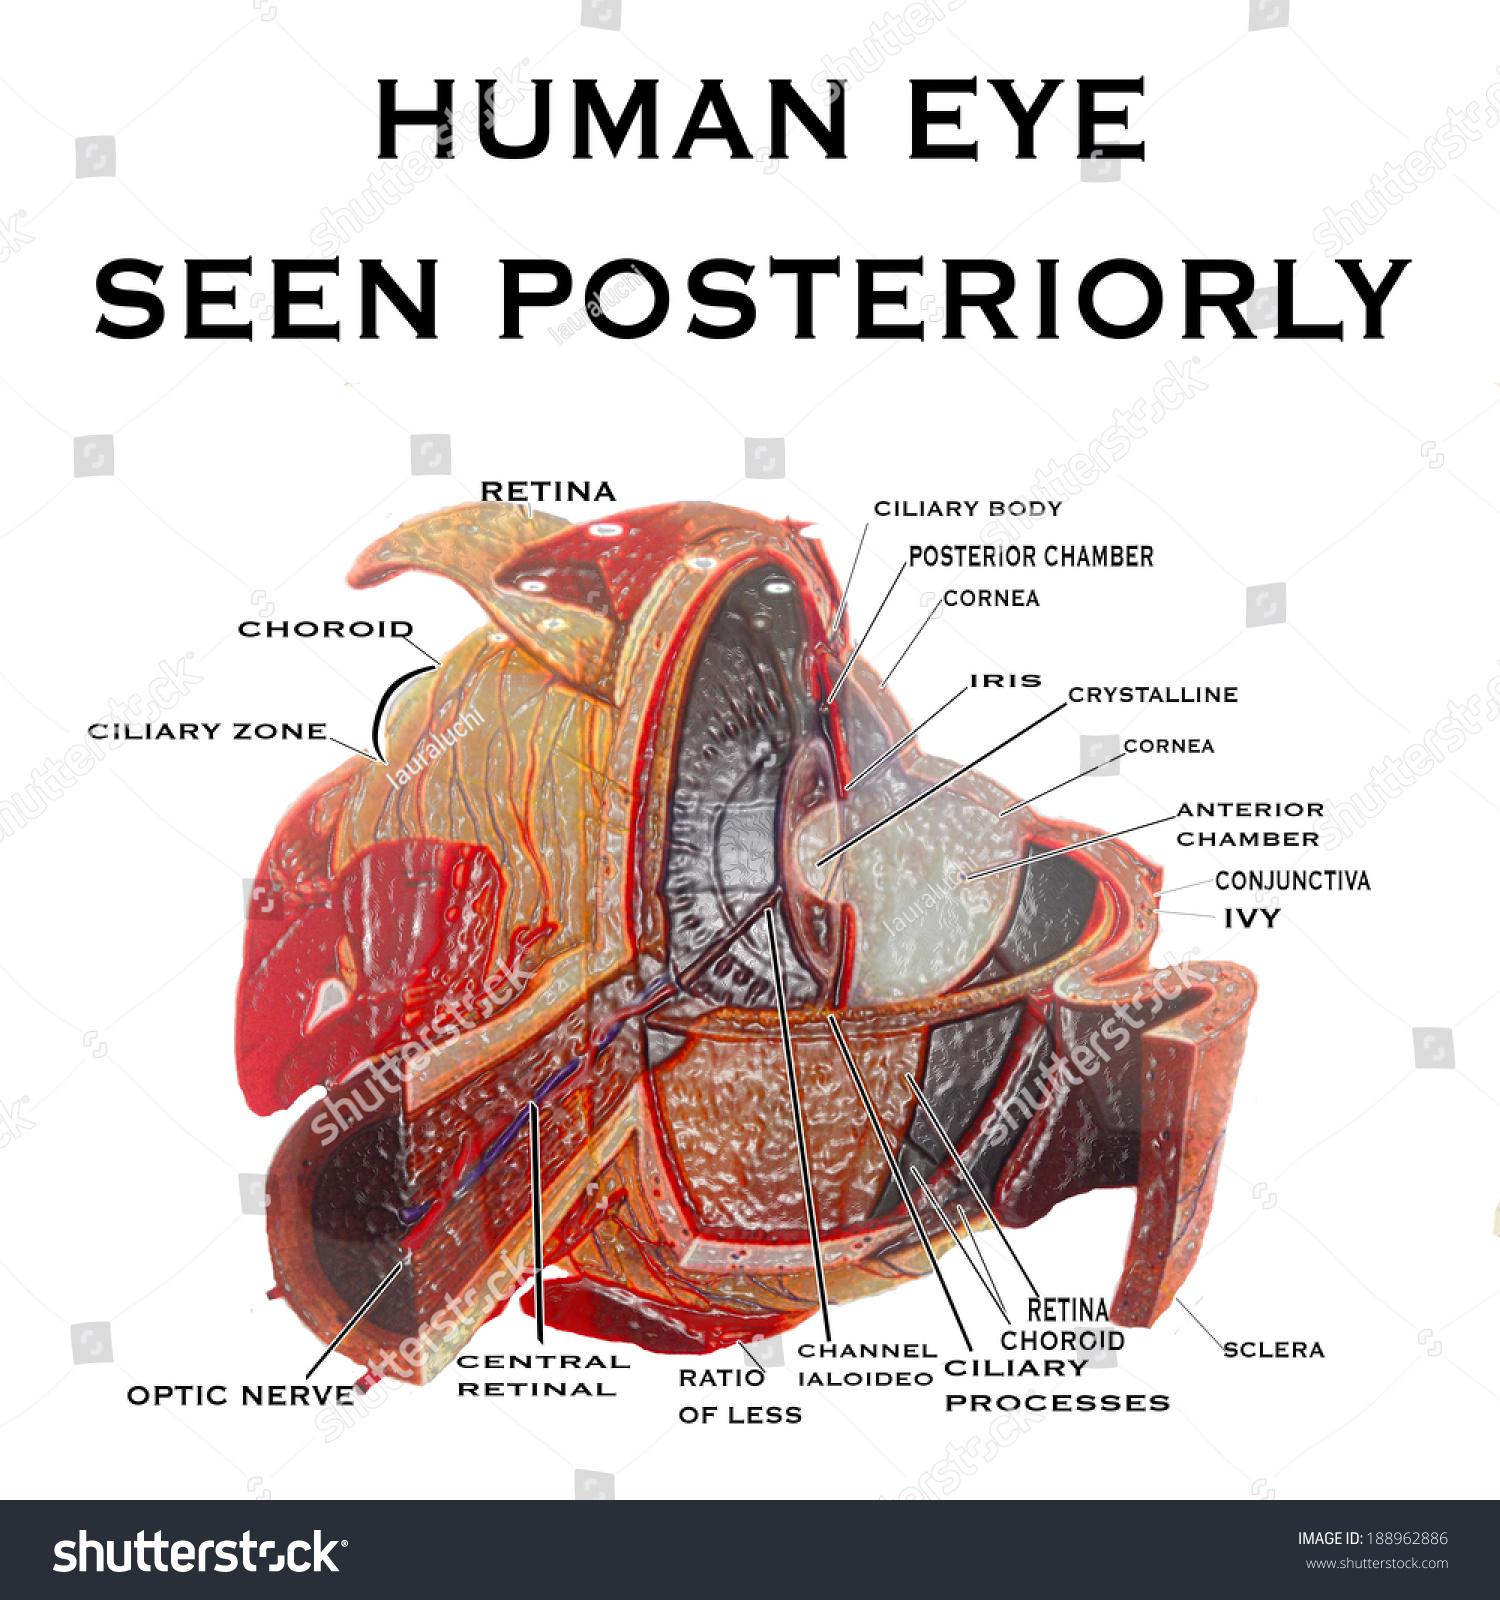 Human Eye Seen Posteriorly Background Vector Stock Vector (Royalty ...